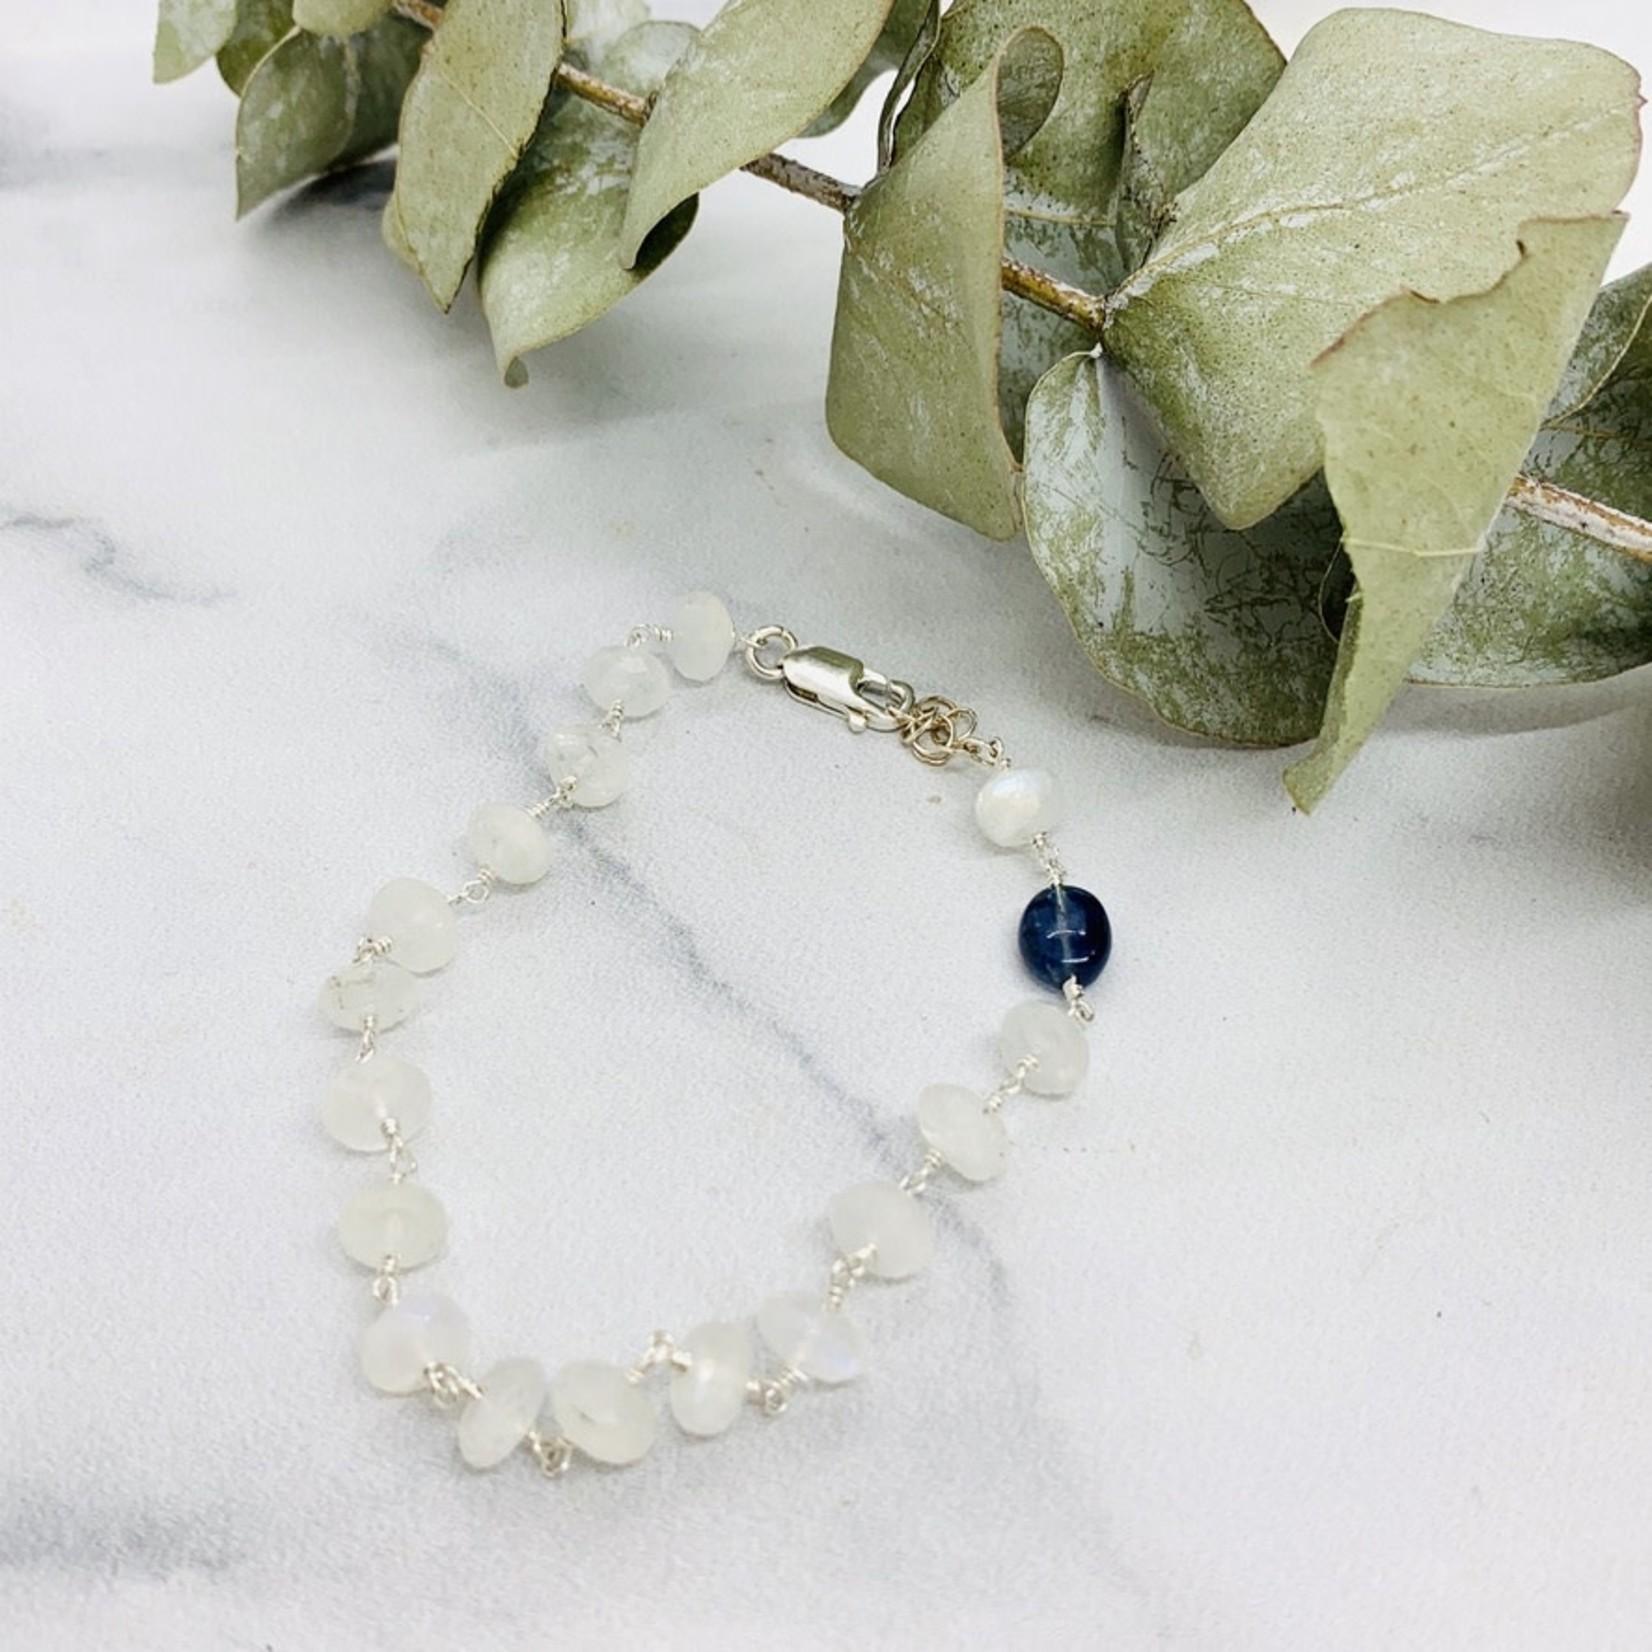 Handmade bracelet with connected rainbow moonstone, 1 kyanite